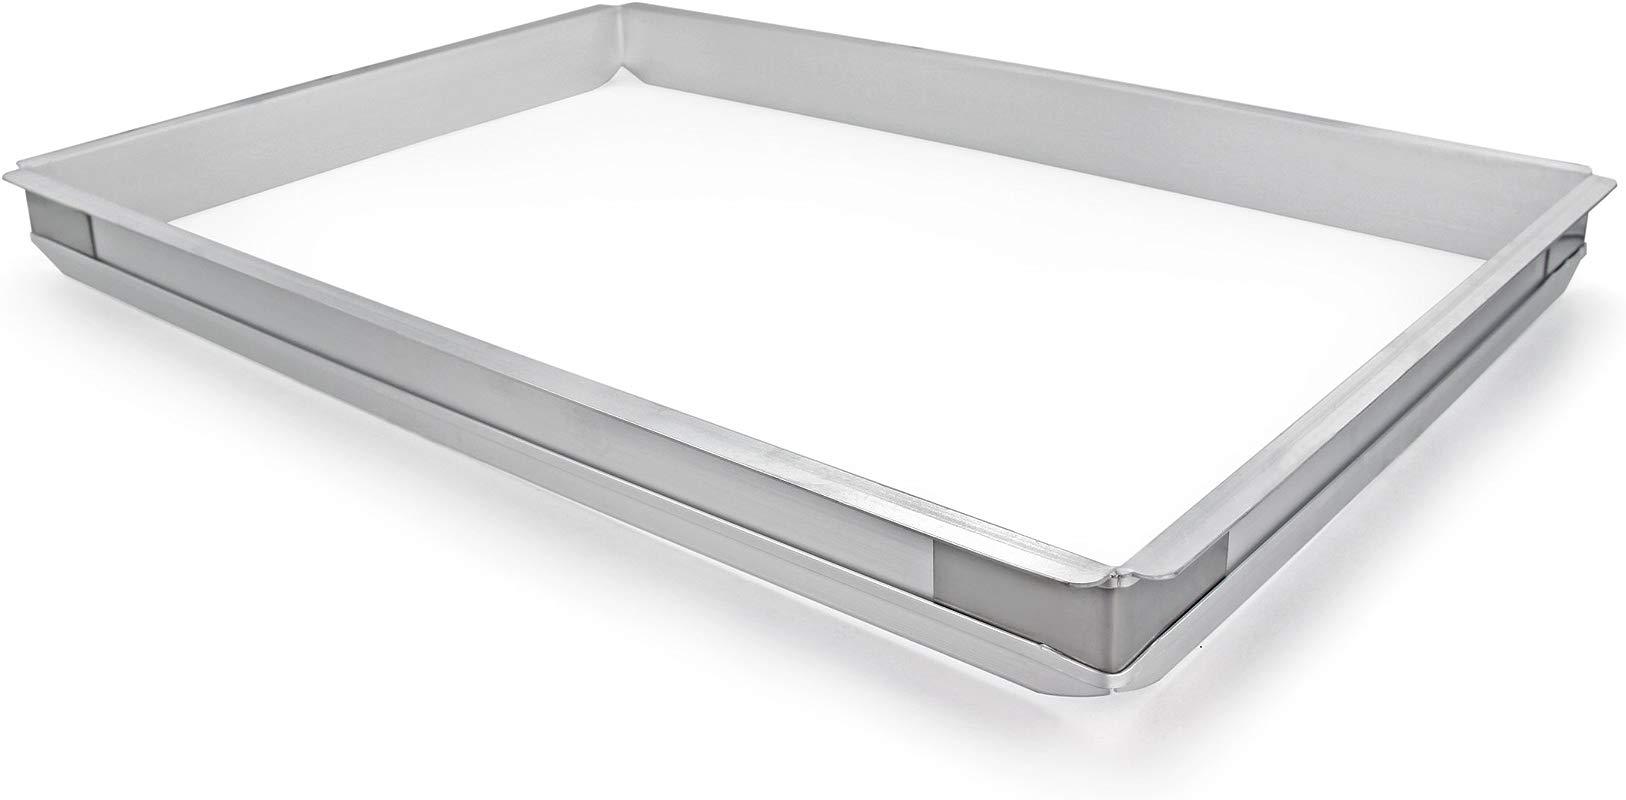 New Star Foodservice 42573 Aluminum Sheet Bun Pan Extender 18 X 26 Inch Full Size